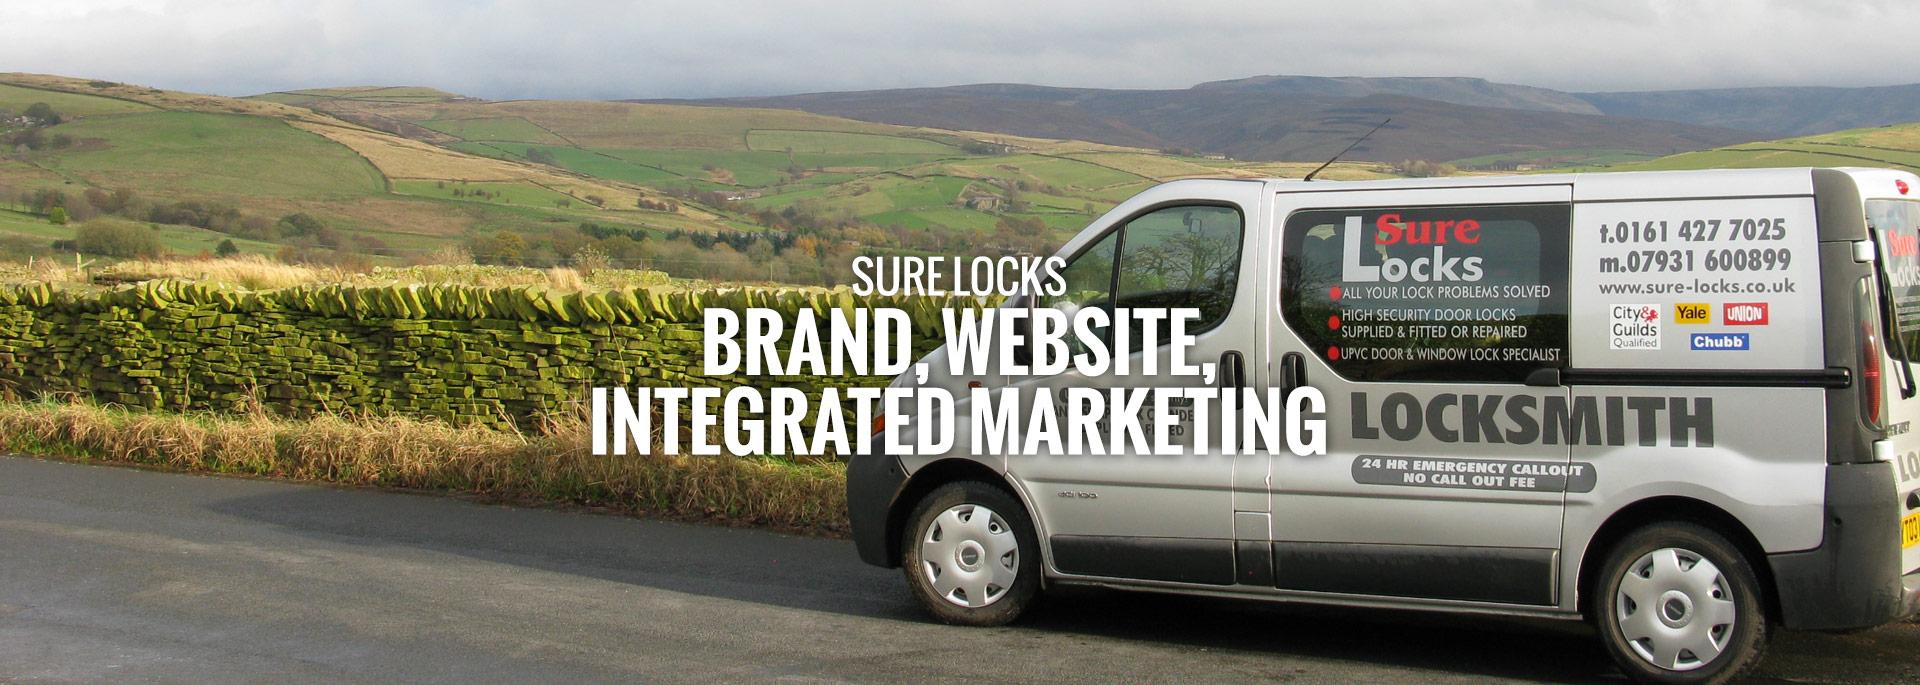 Sure locks brand and website design marketing